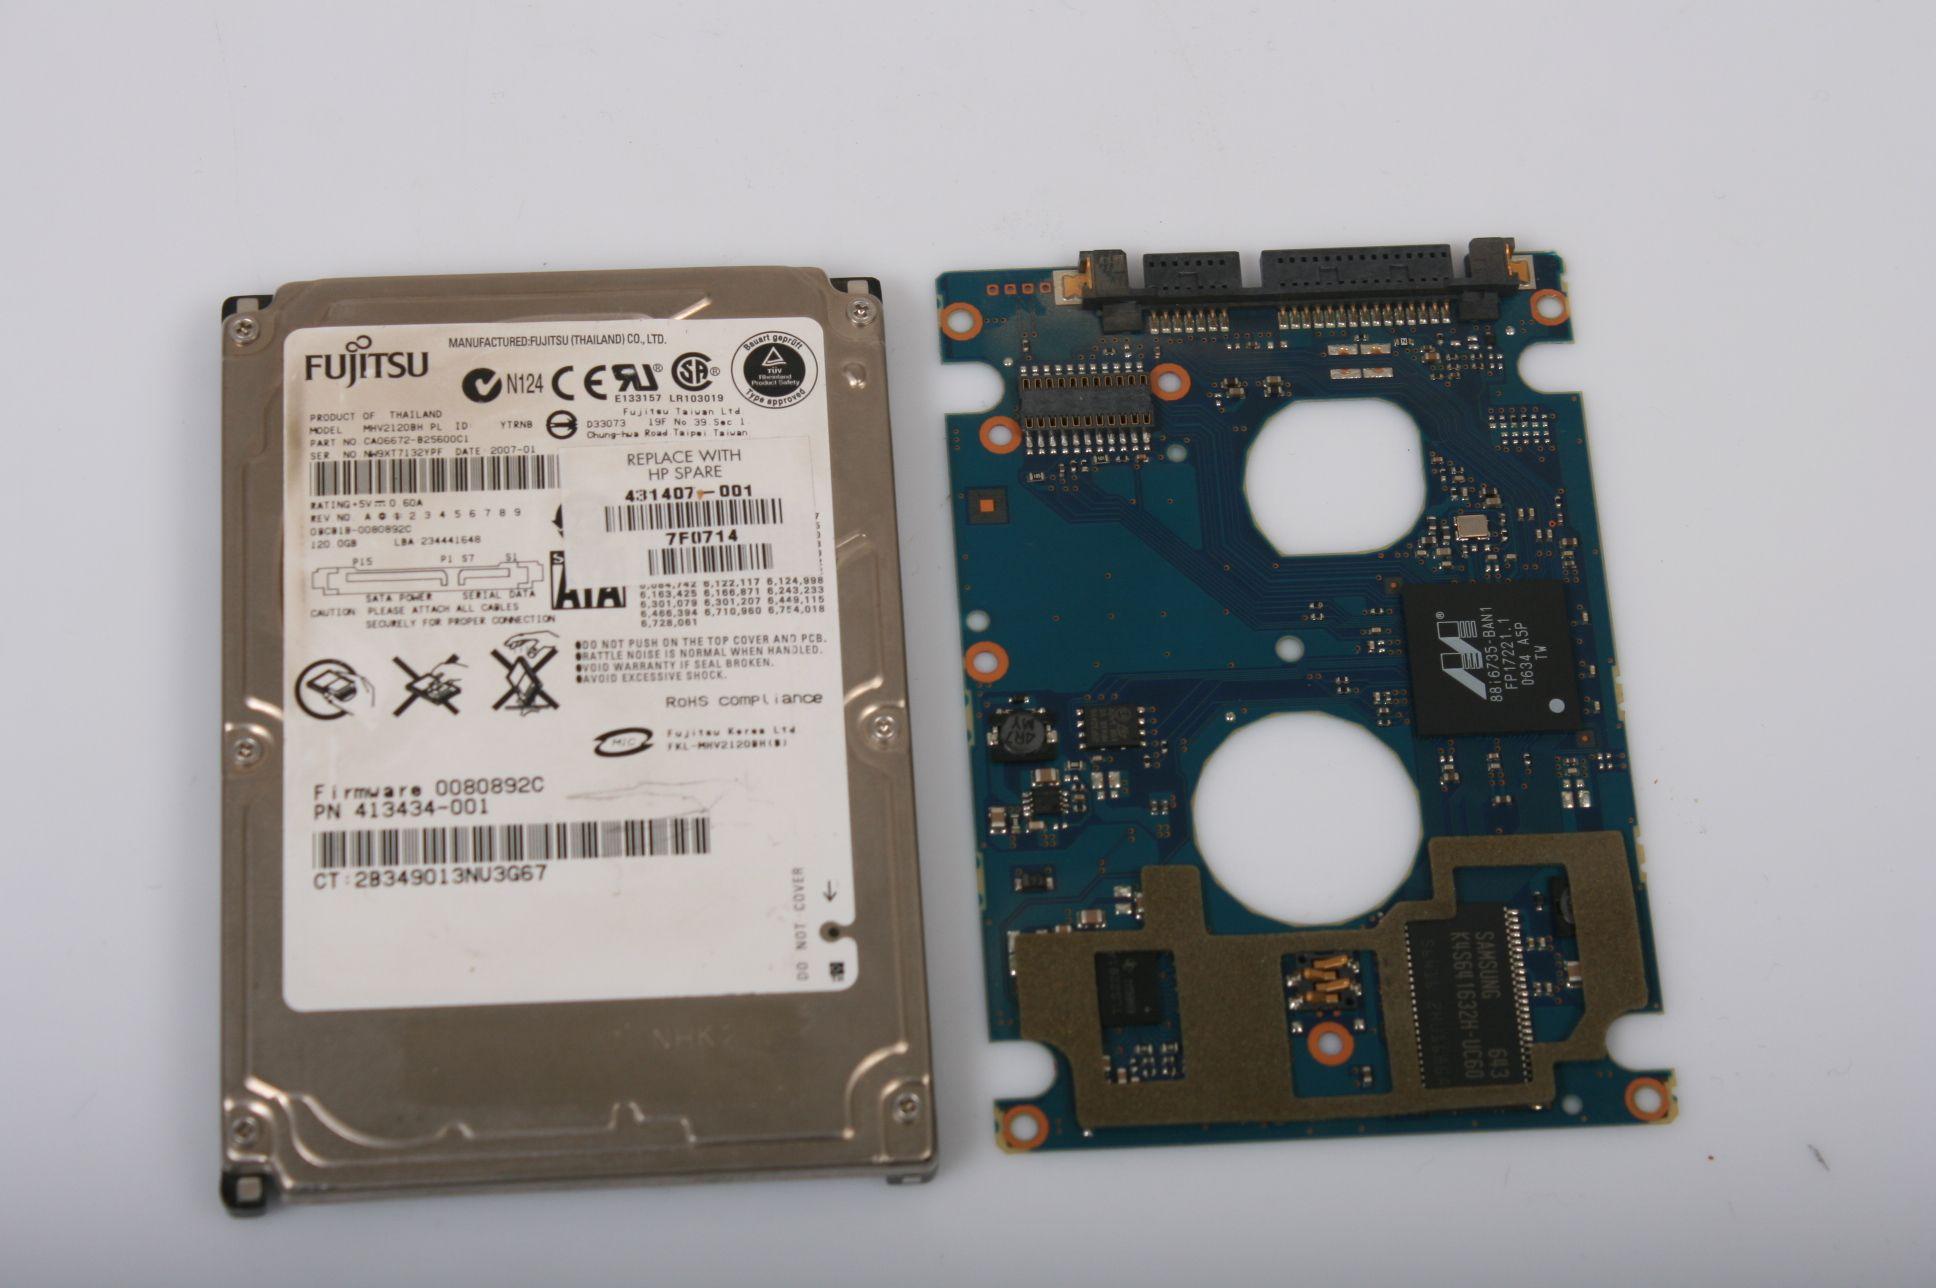 FUJITSU MHV2120BH 120GB 2.5 SATA HARD DRIVE / PCB (CIRCUIT BOARD) ONLY FOR DA